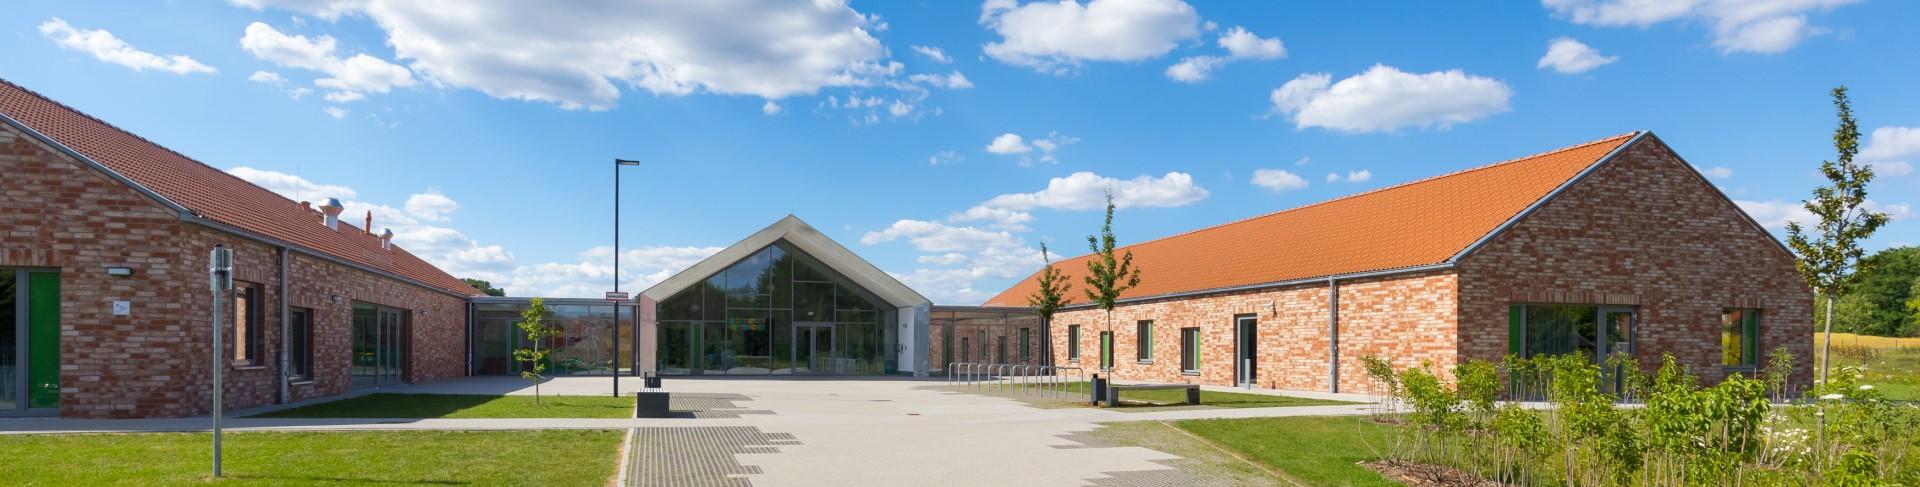 Grundschule Egestorf